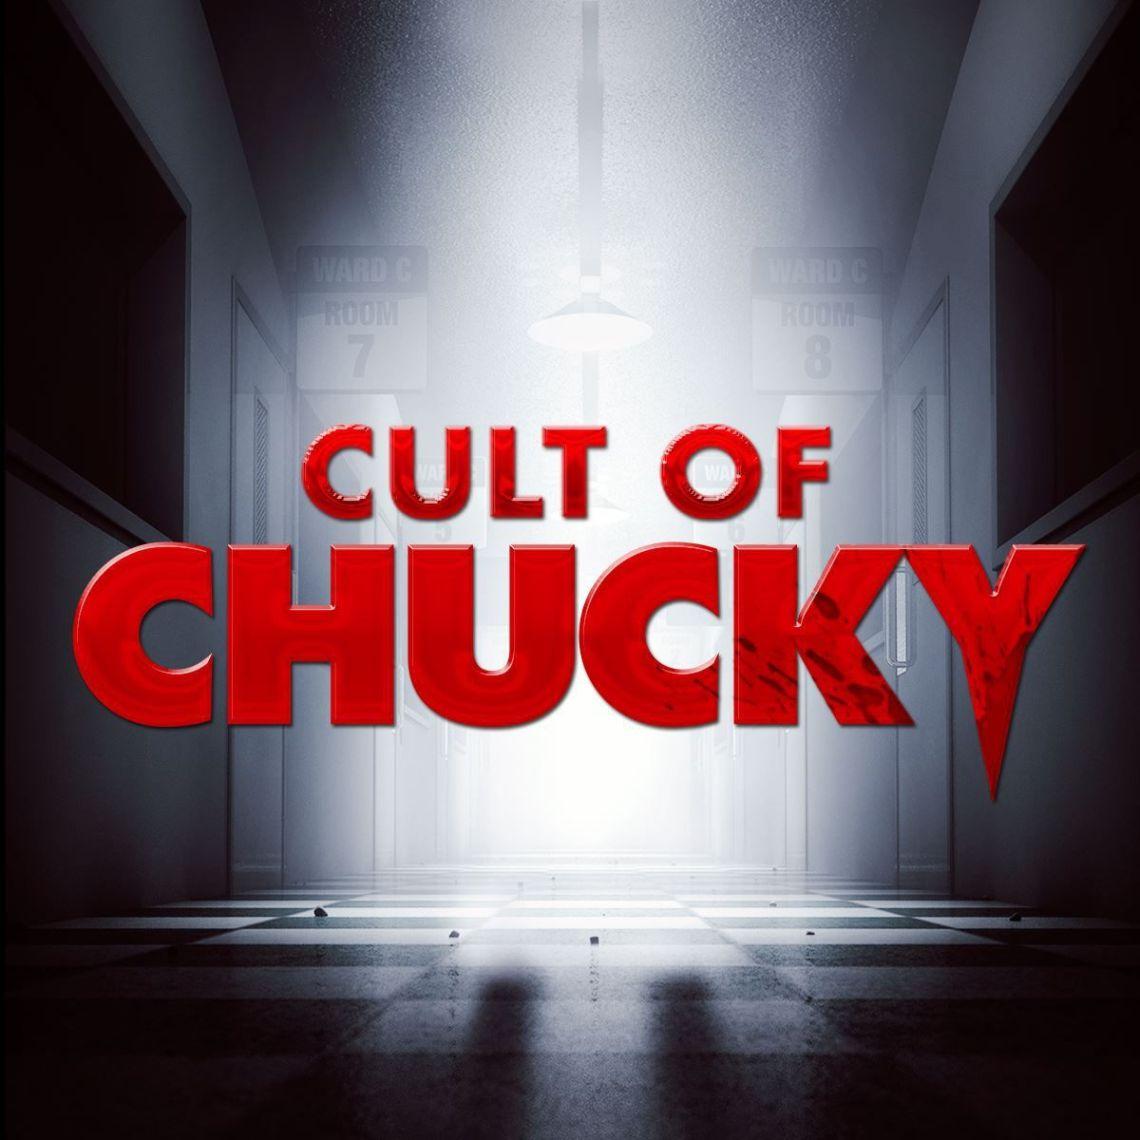 cult-chucky-poster.jpg